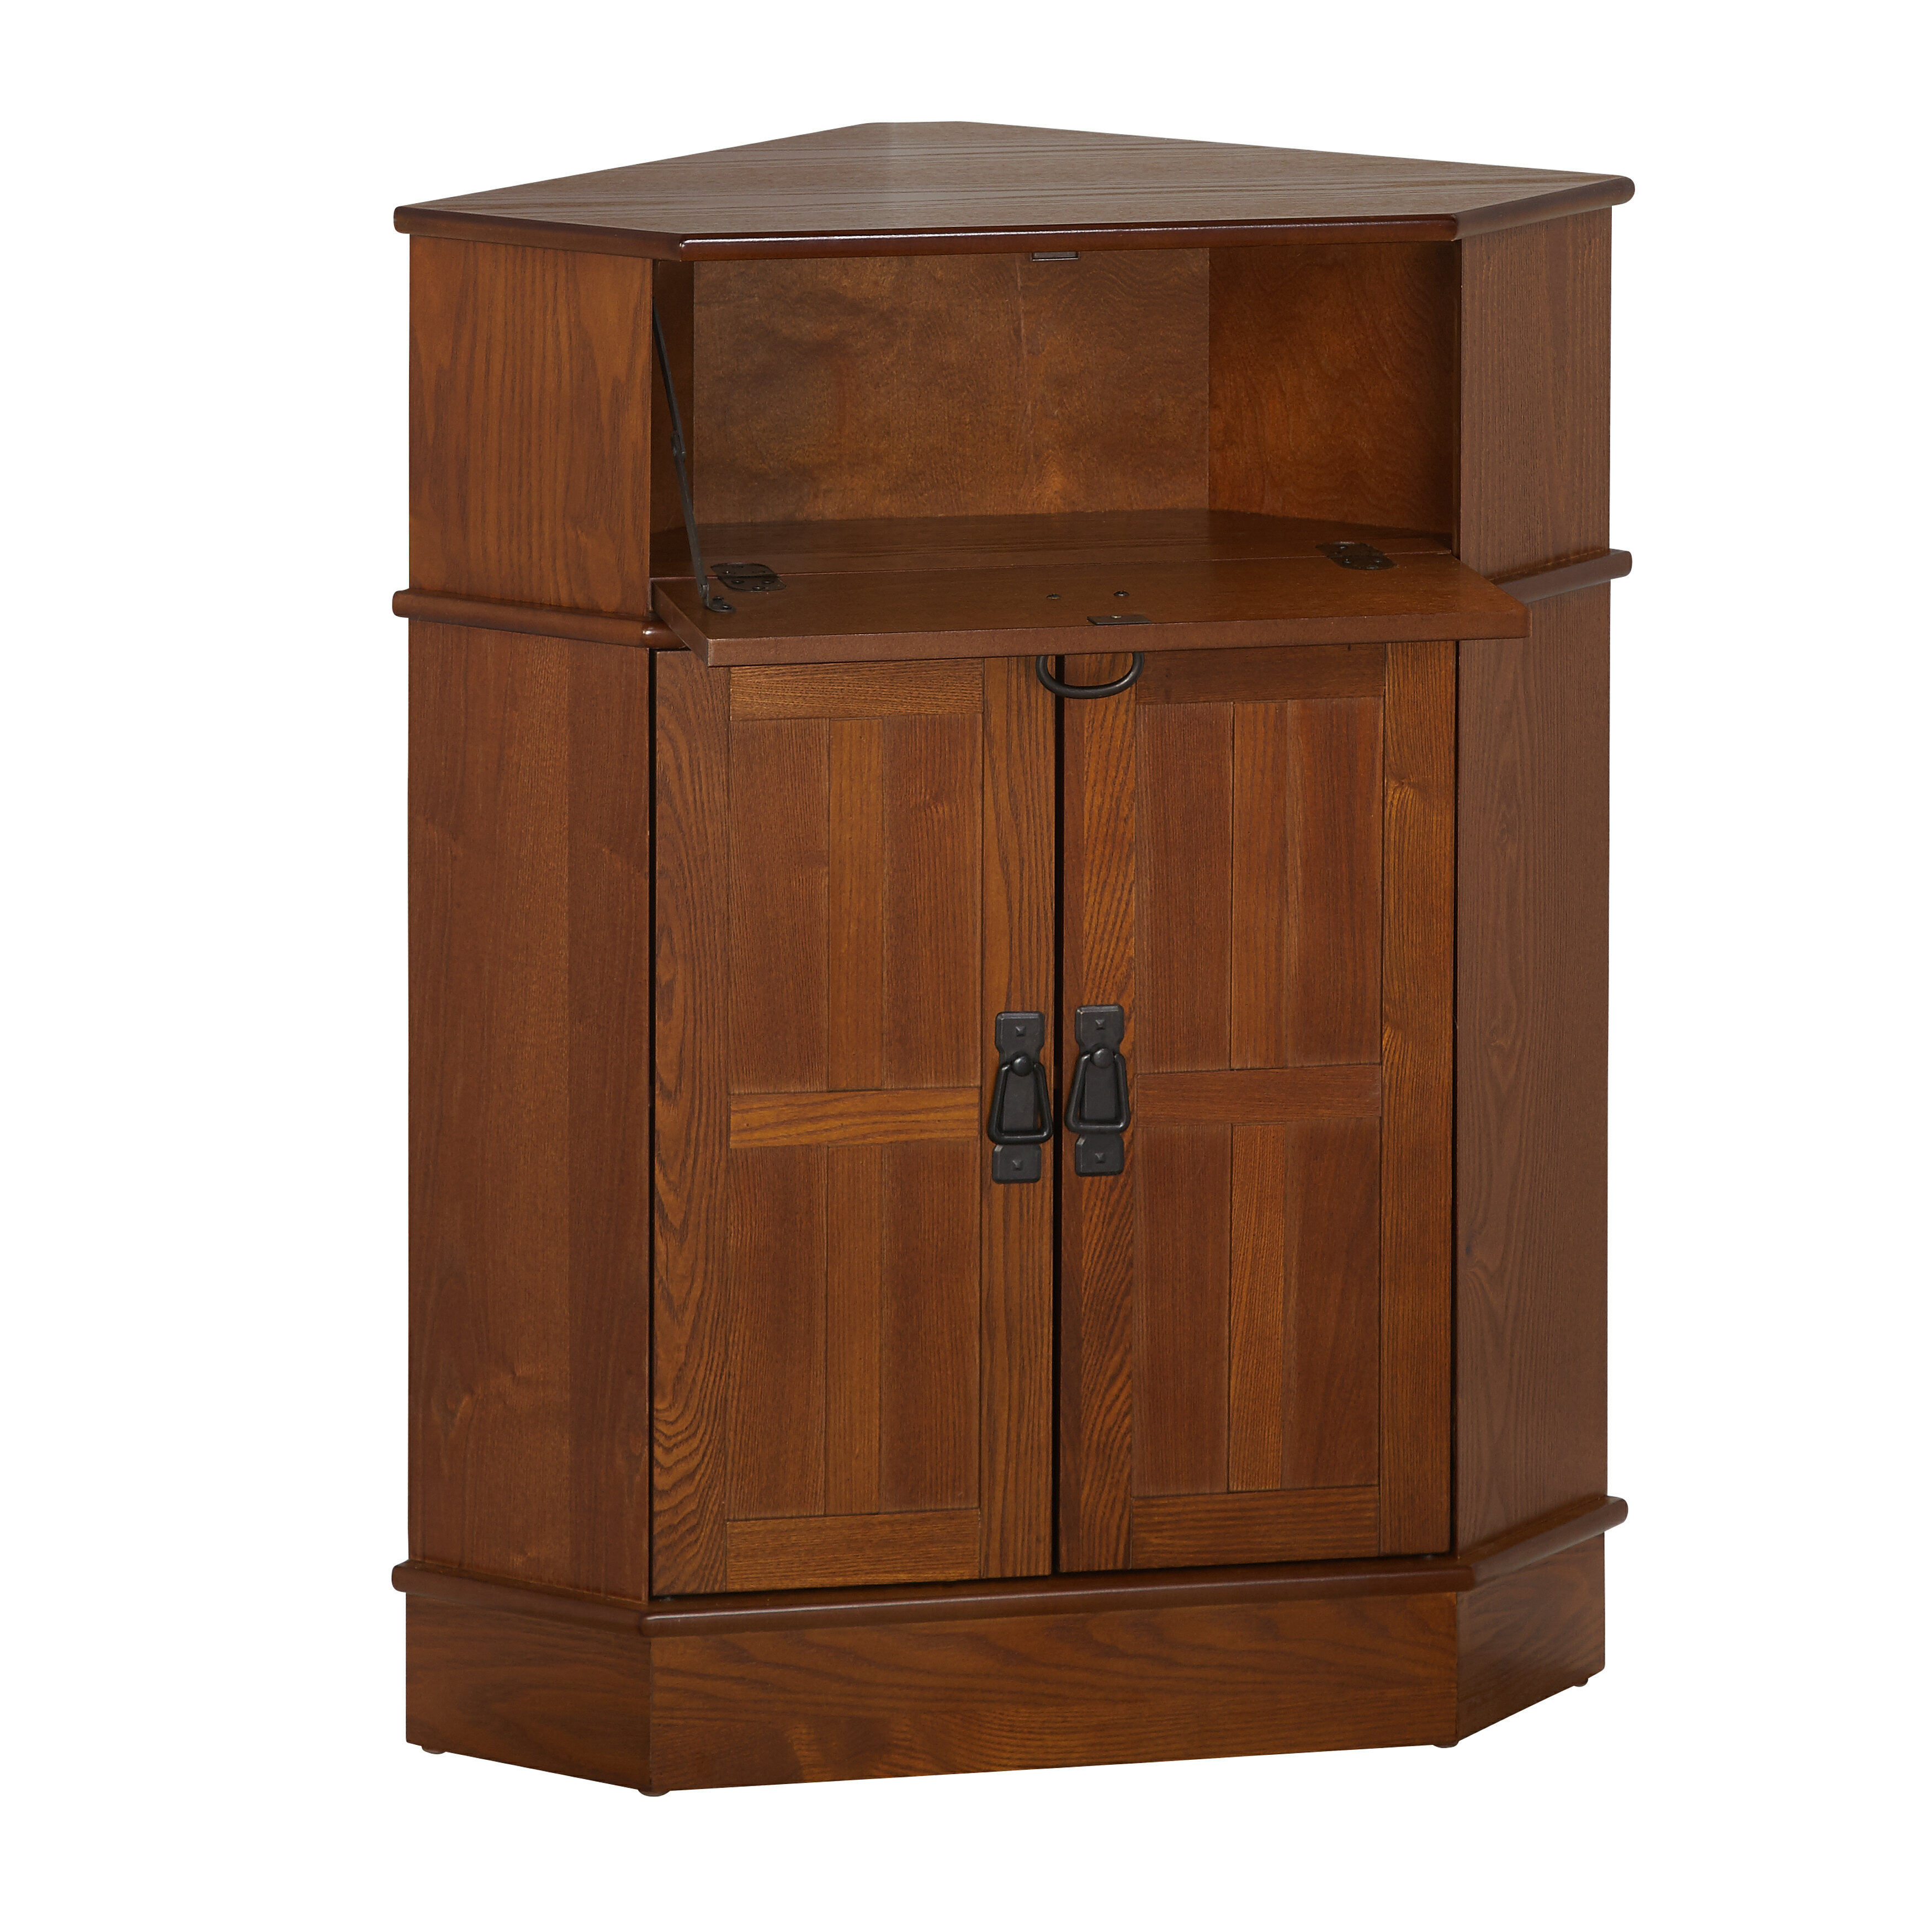 Wood furniture door Teak Wood The Home Depot Charlton Home Gulley Door Corner Cabinet Reviews Wayfair